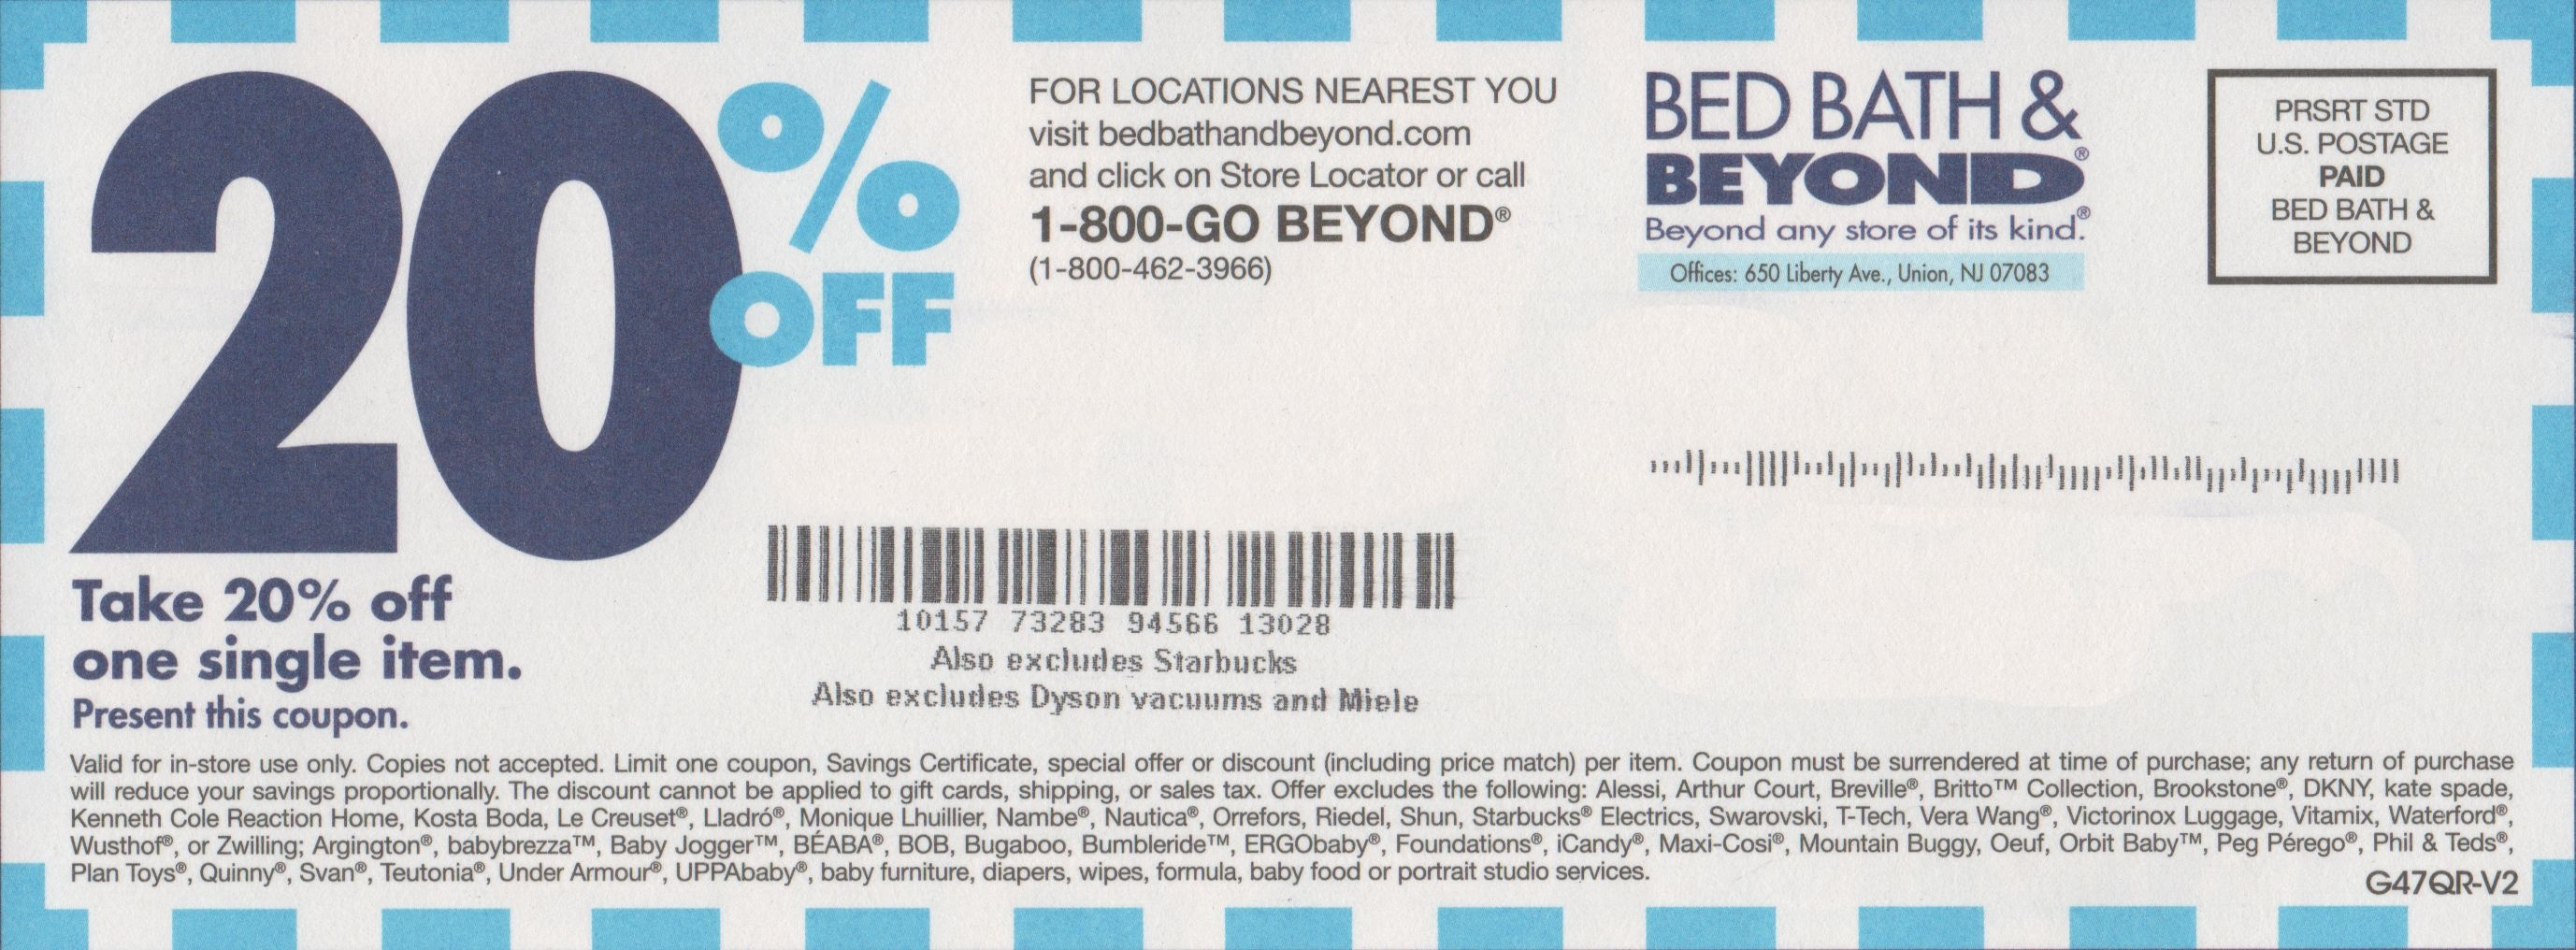 Bed Bath & Beyond Printable Coupon 20 Percent Off In-Store | Bed - Free Printable Bed Bath And Beyond 20 Off Coupon